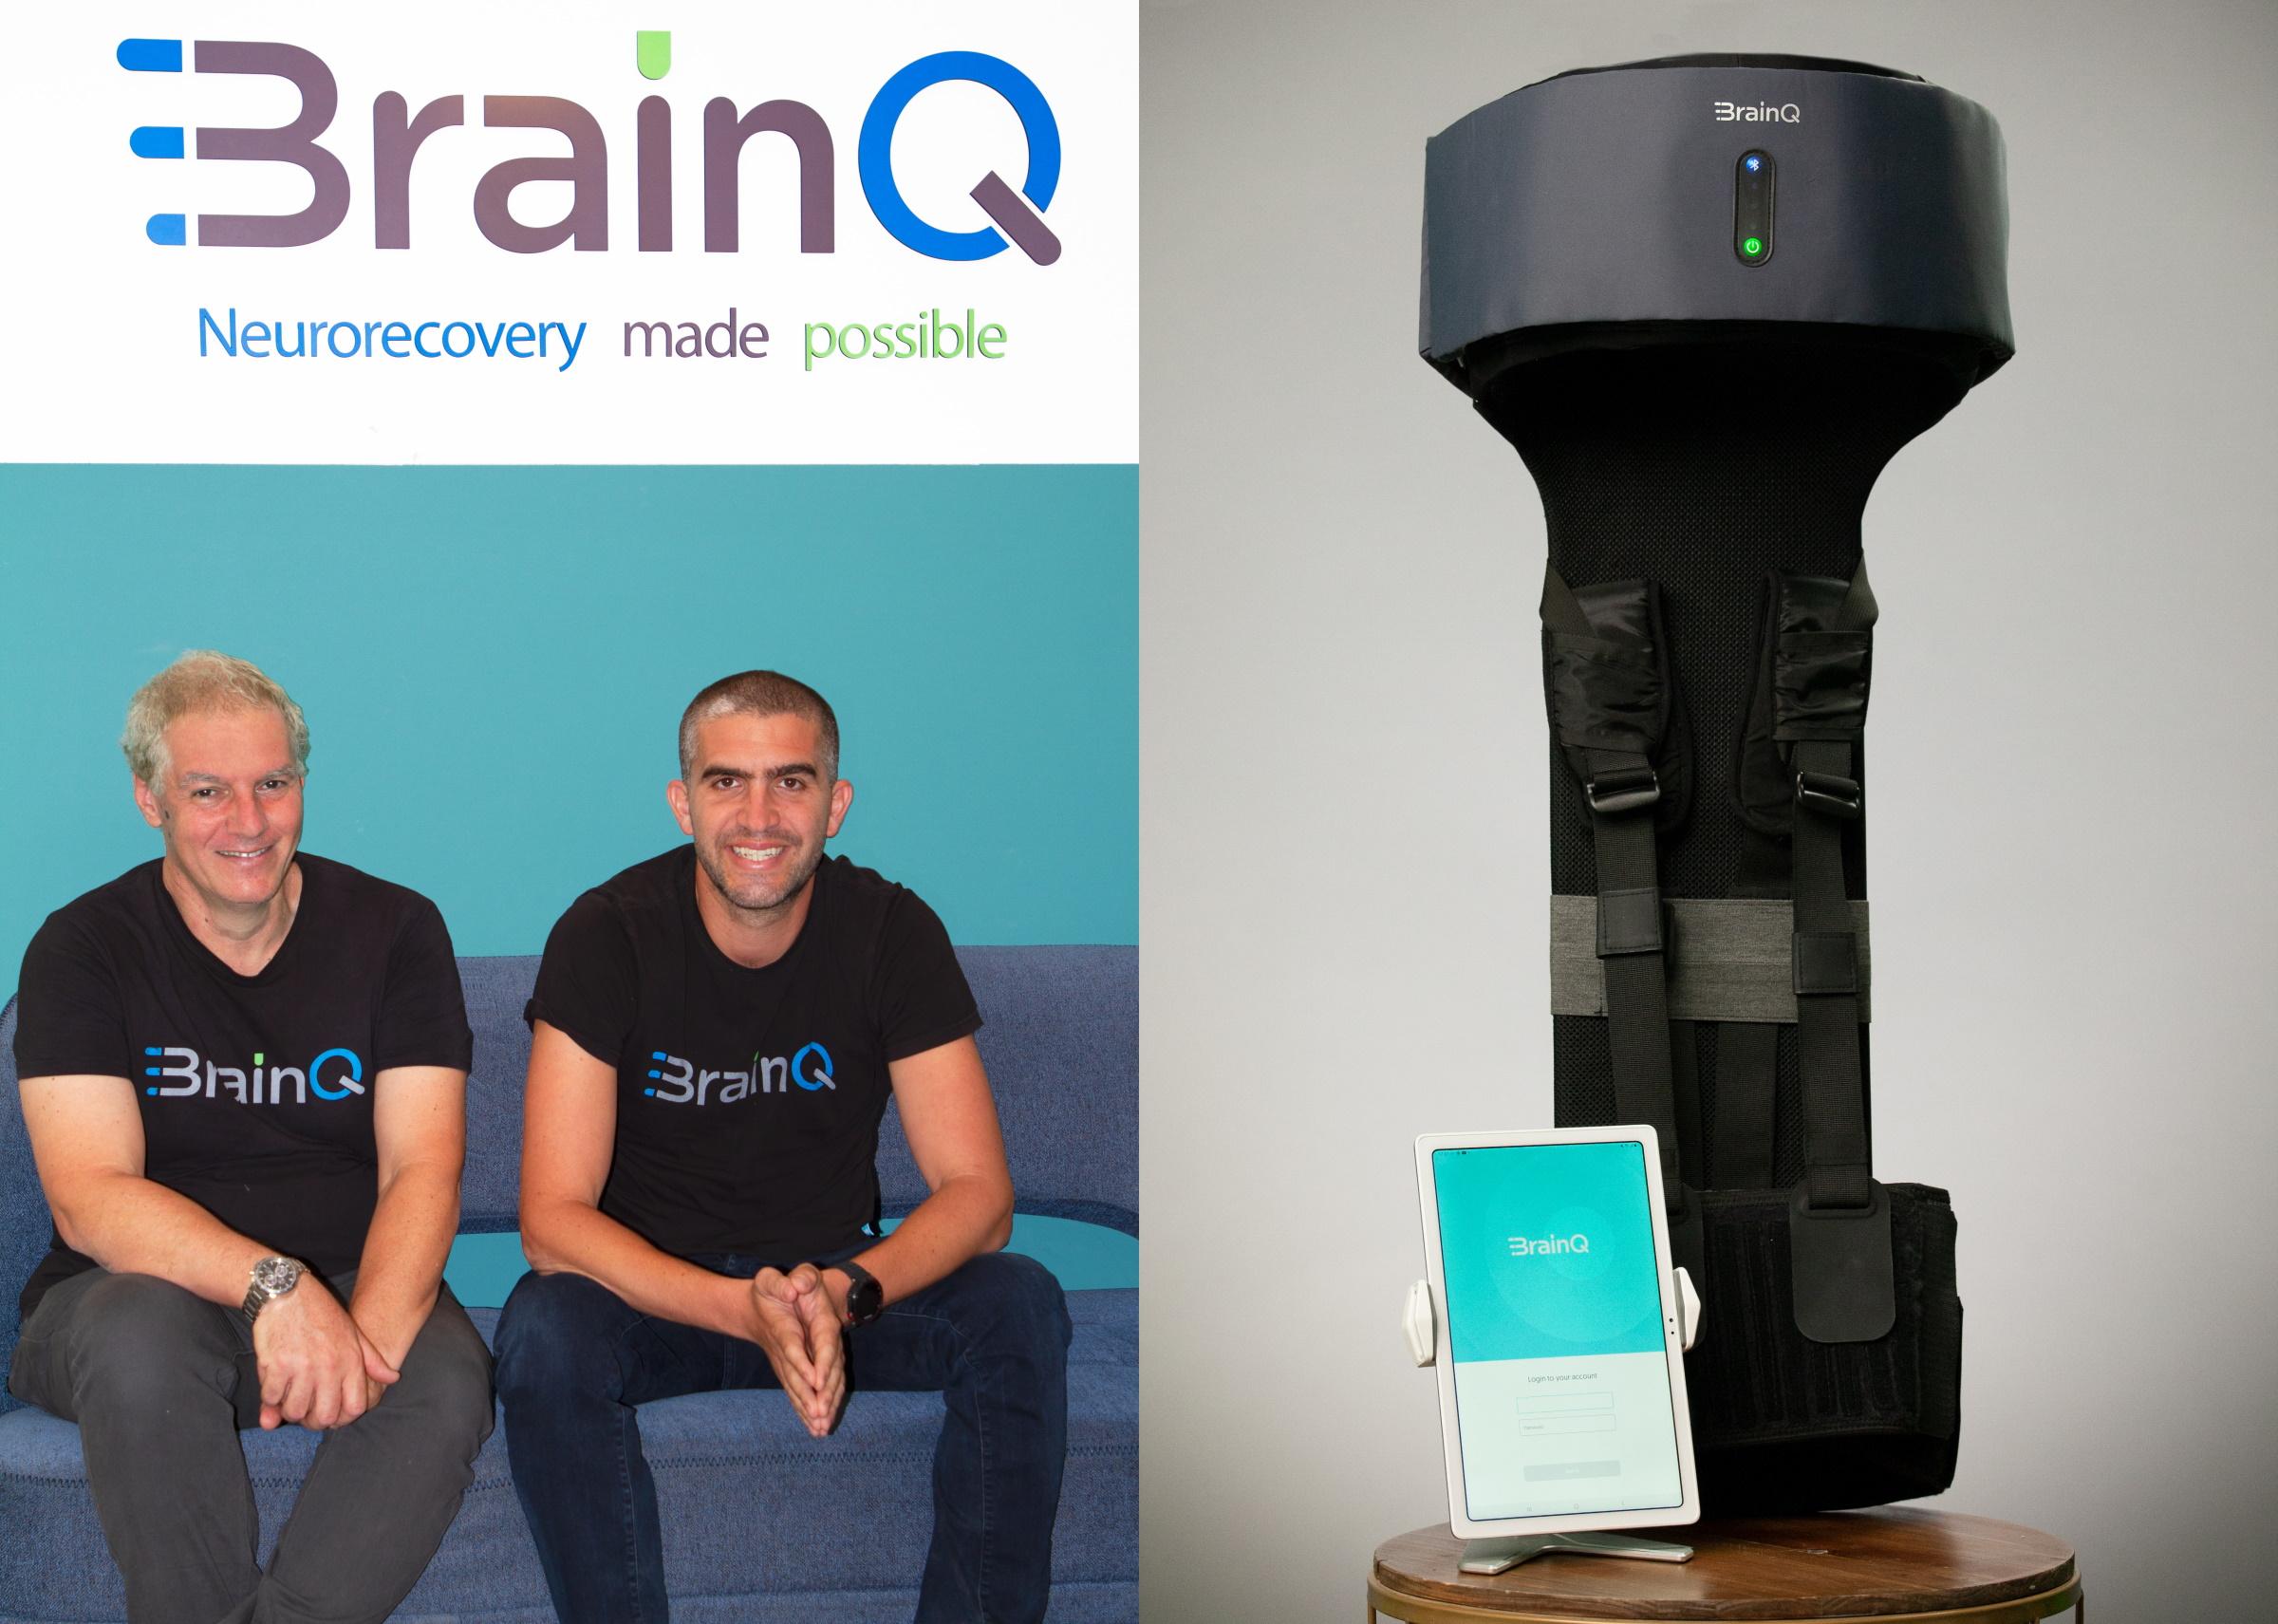 BrainQ founders